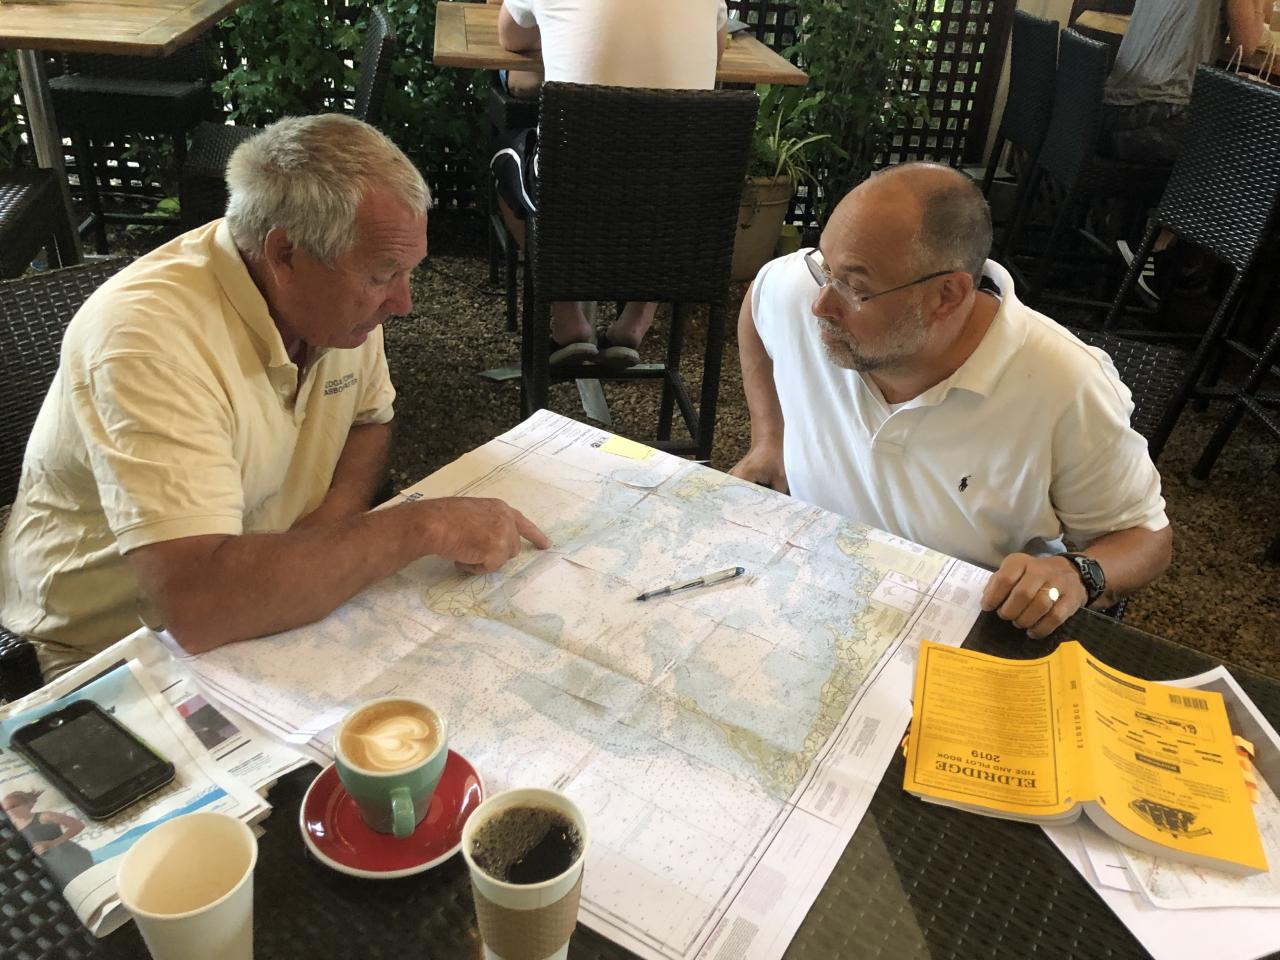 Doug McConnell and Edgartown Harbor Master Charlie Blair